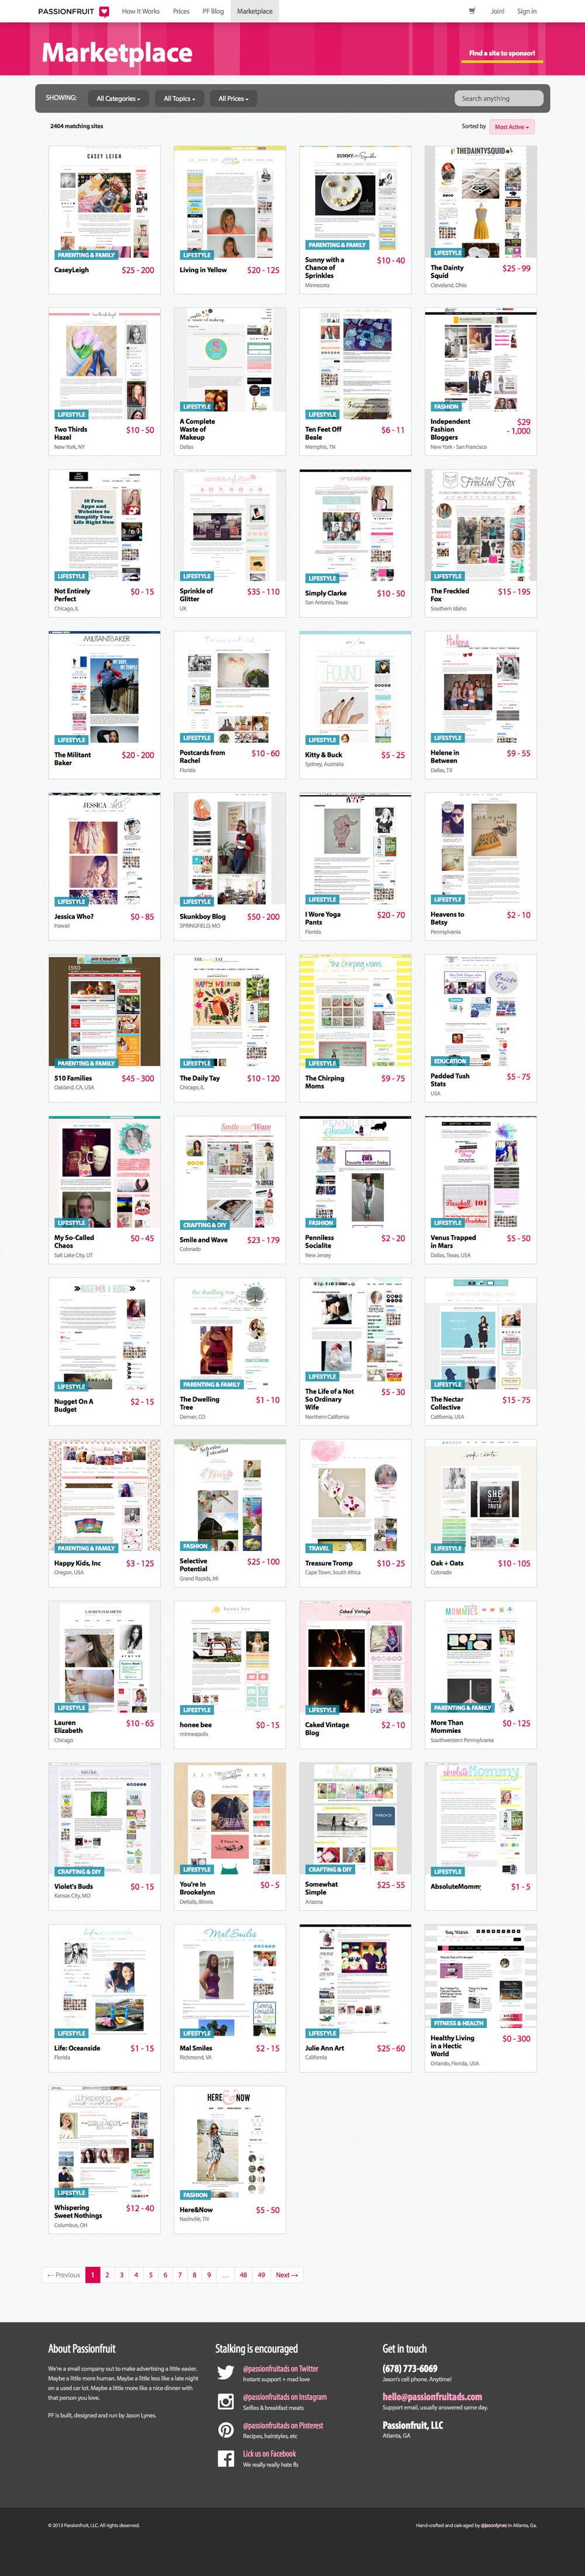 Passionfruit Ads- Marketplace-2014-04-02-144824.jpg